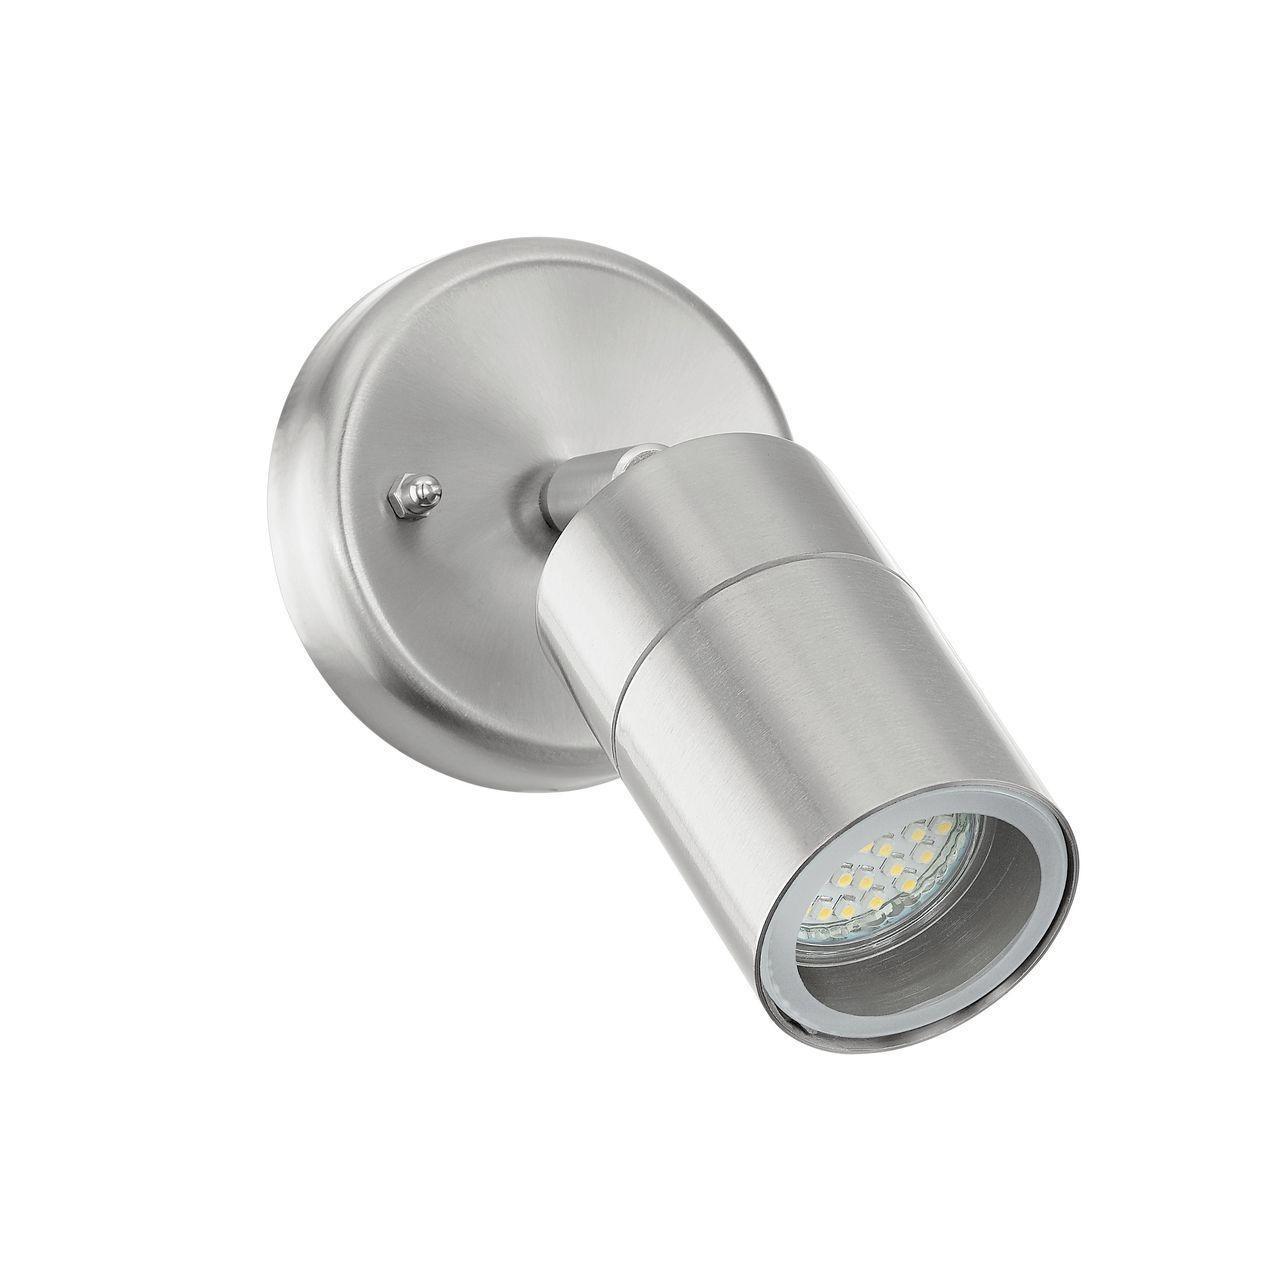 Уличный светильник Eglo 93268, серый eglo 91342